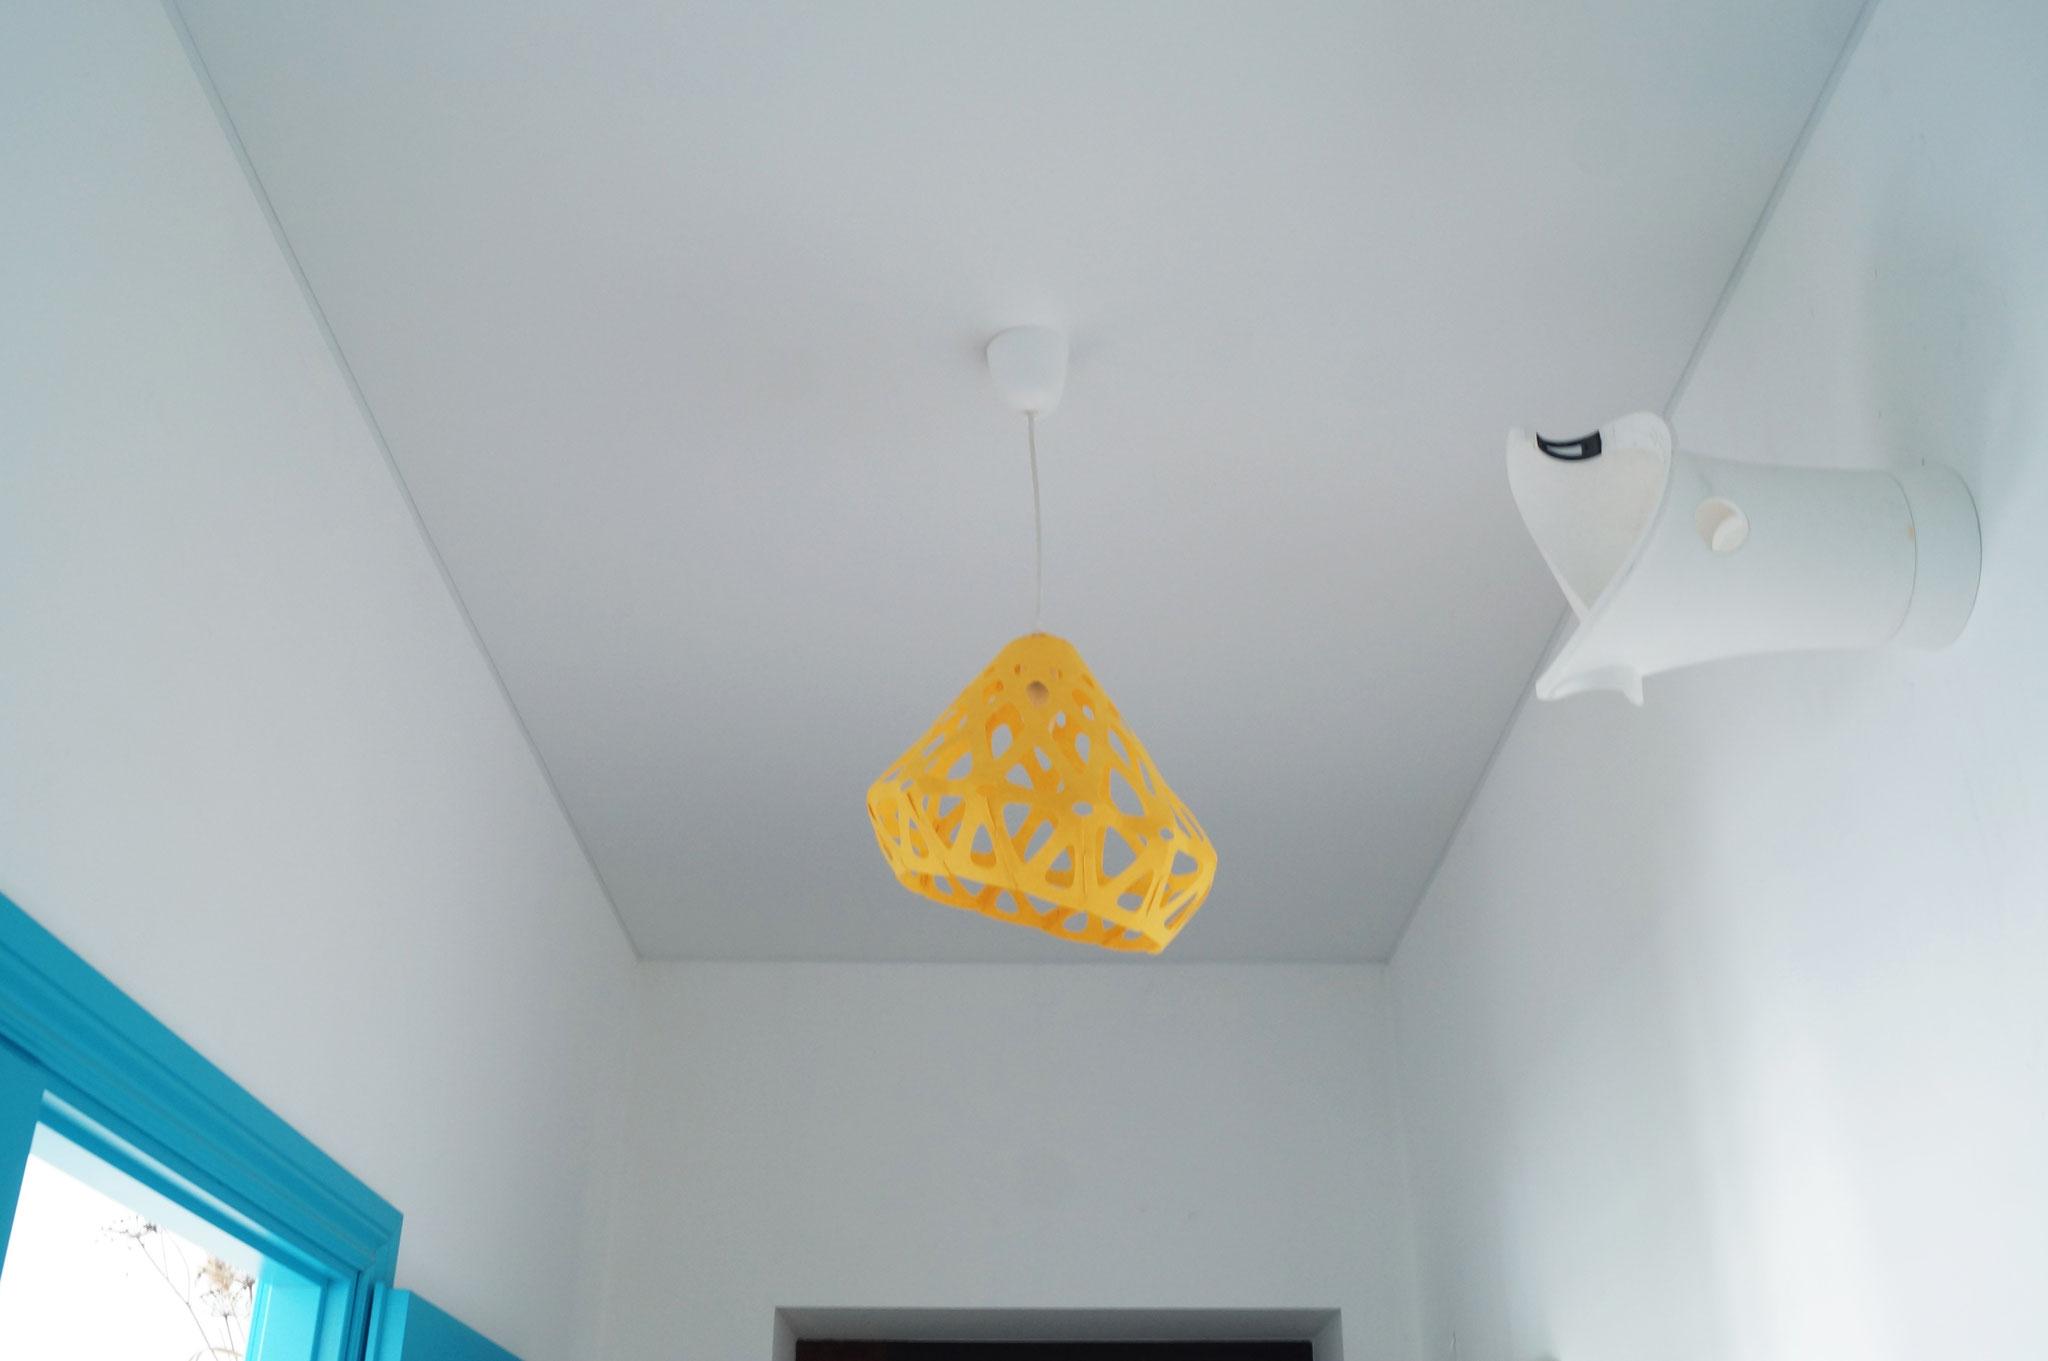 Желтый подвес и голубые двери